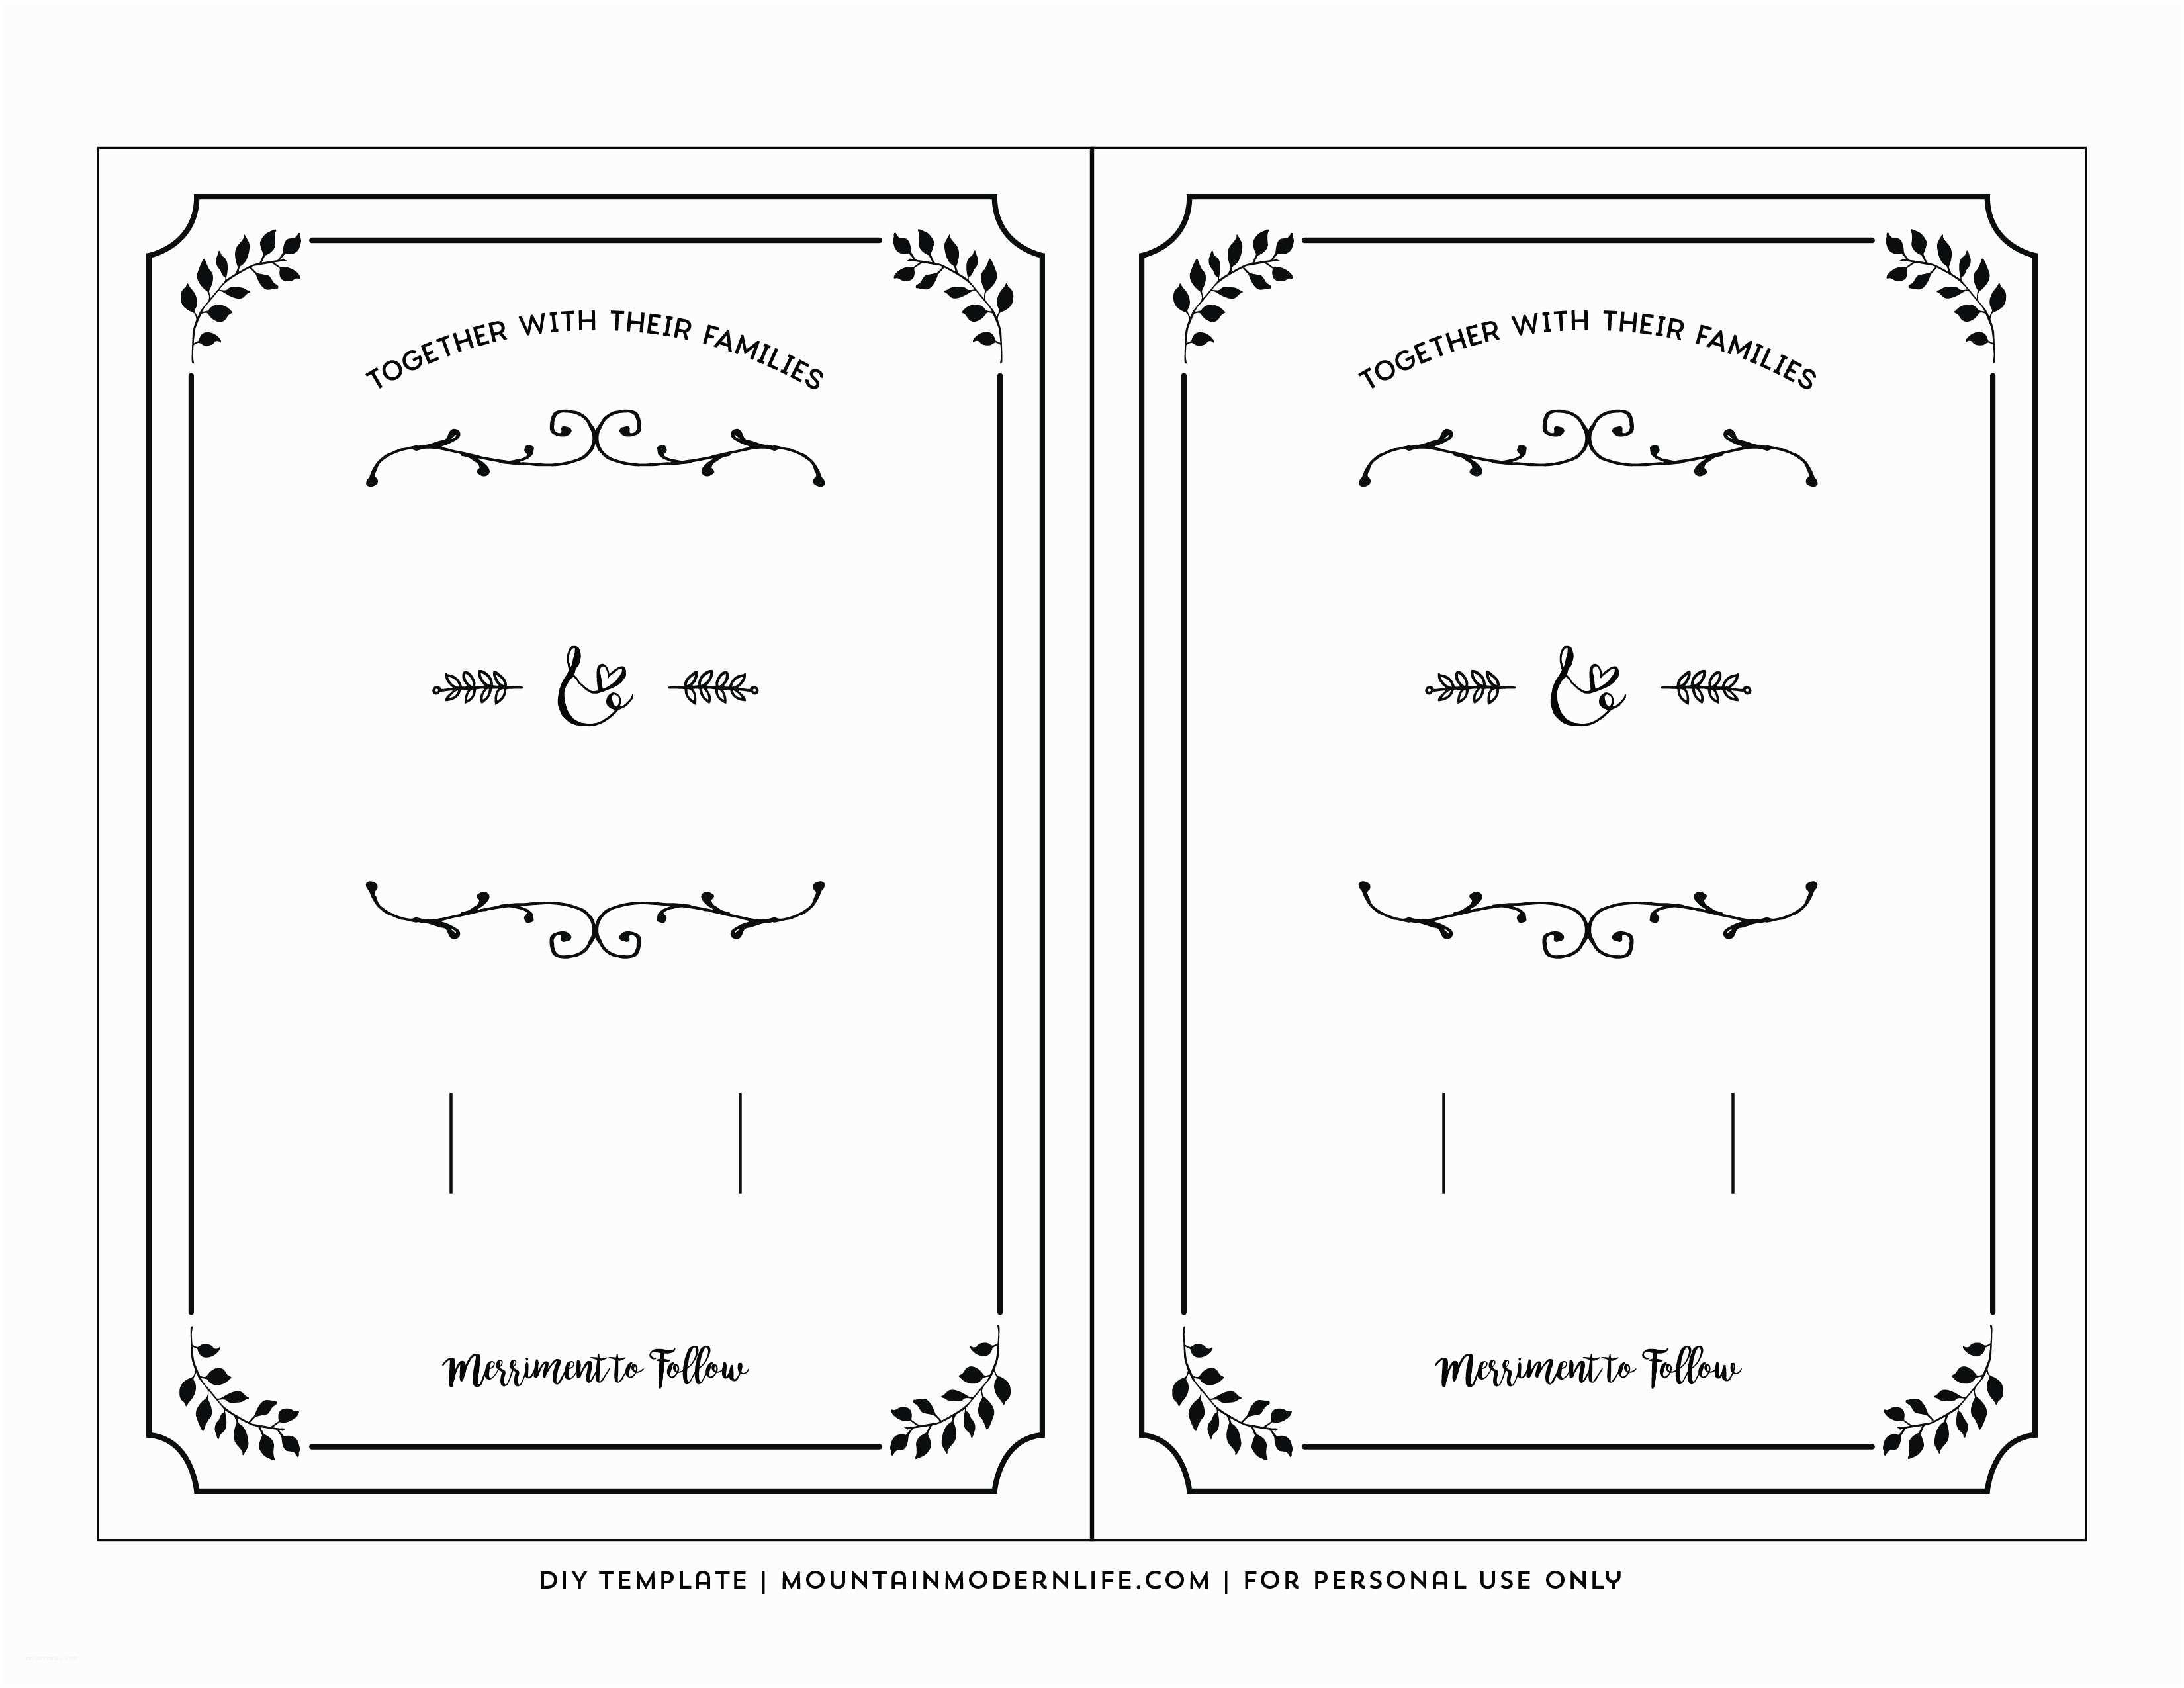 Free Printable Wedding Invitations Templates Downloads Printable Wedding Invitations Templates Free